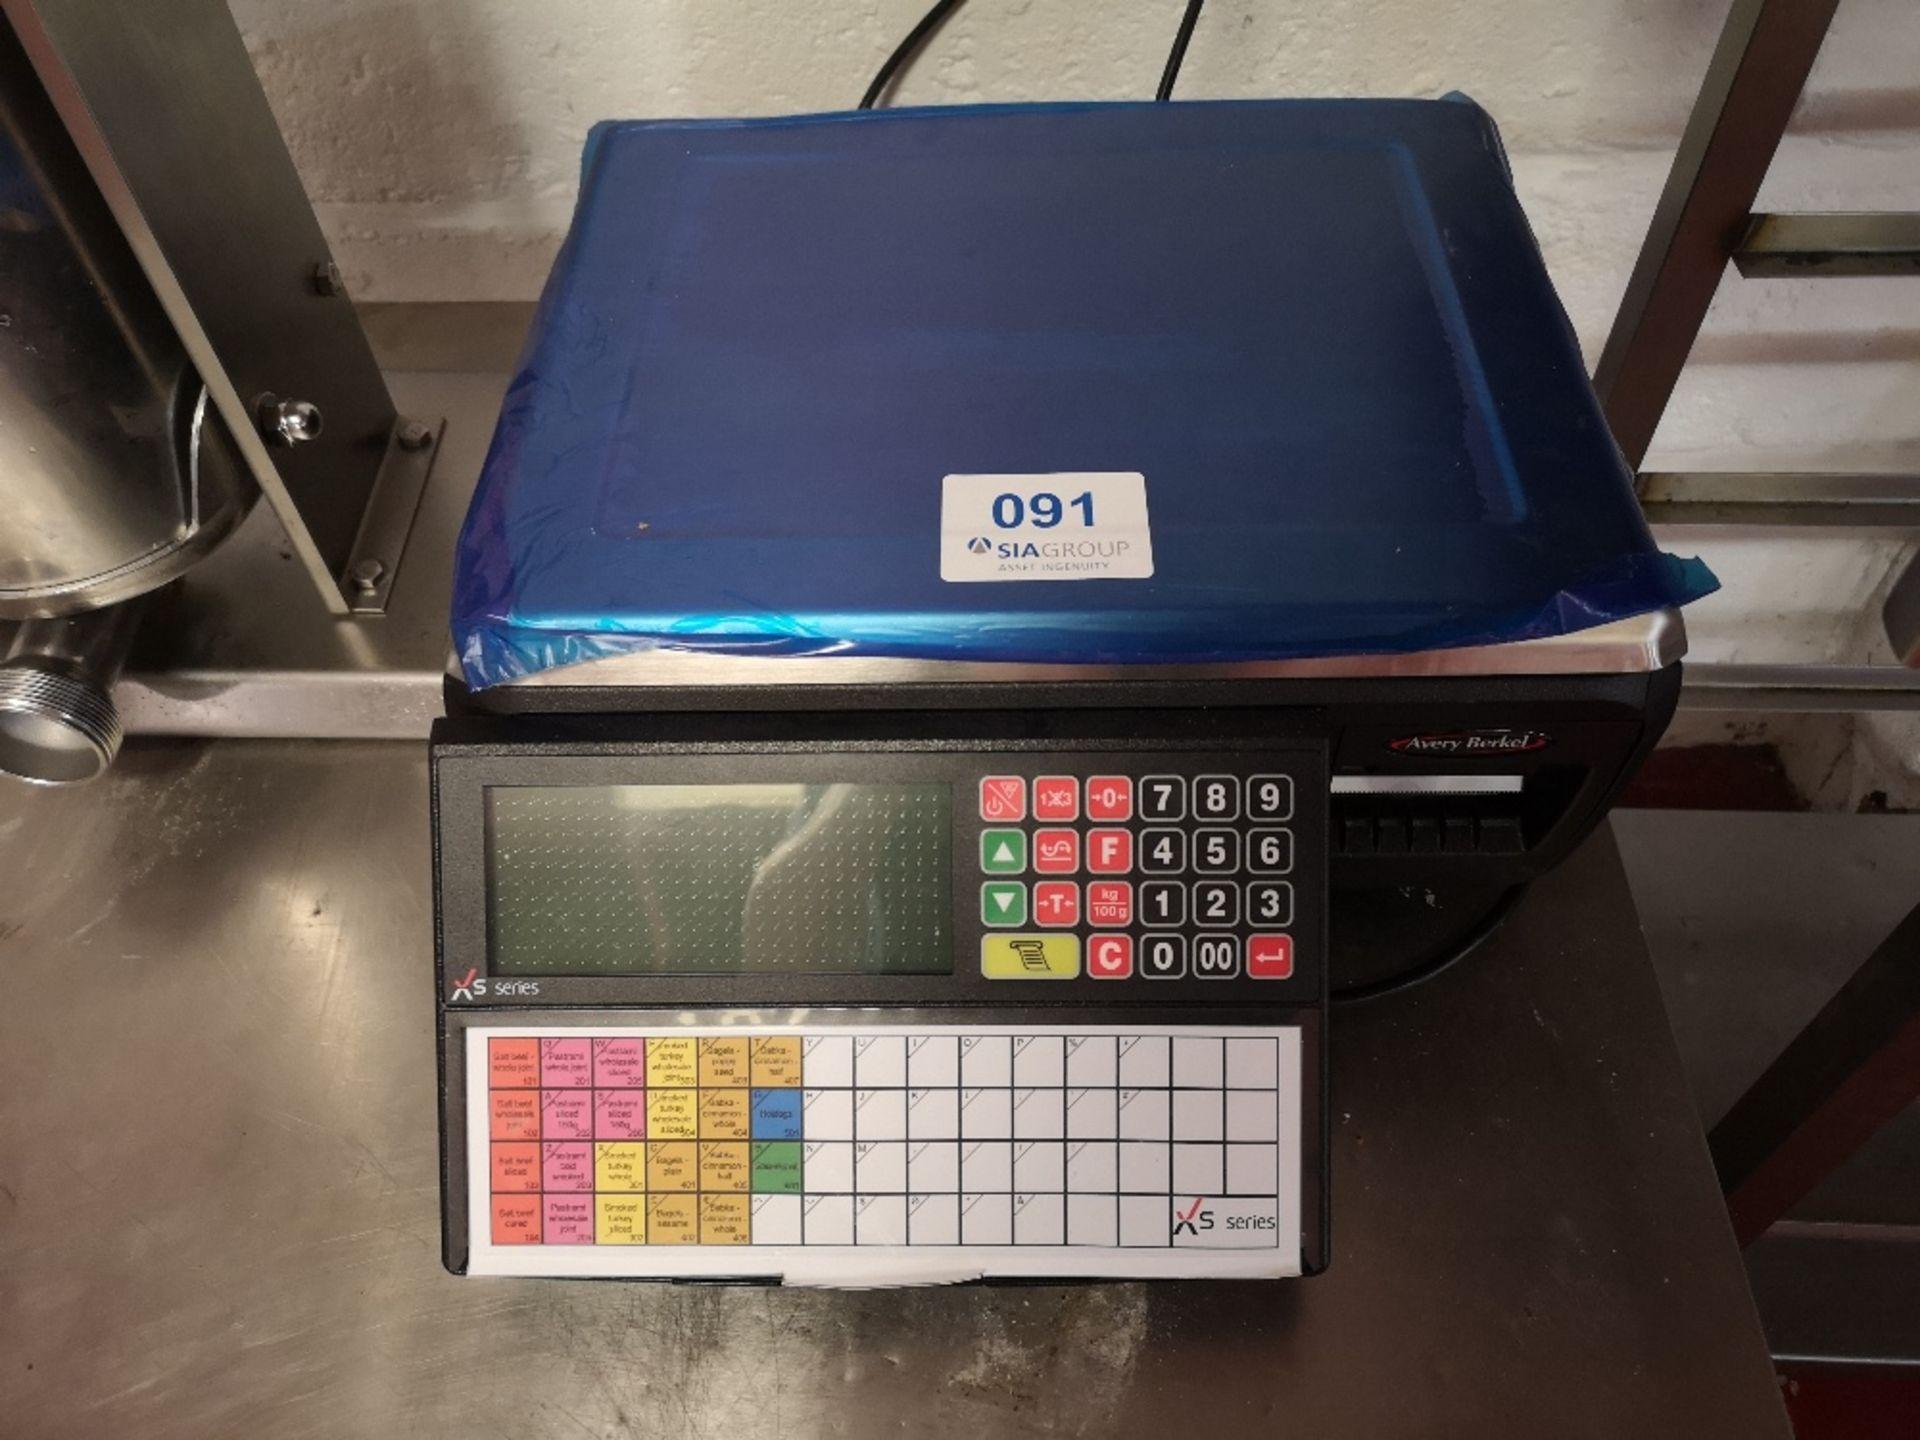 Avery Berkel XS100 Label & Receipt Printing Scale